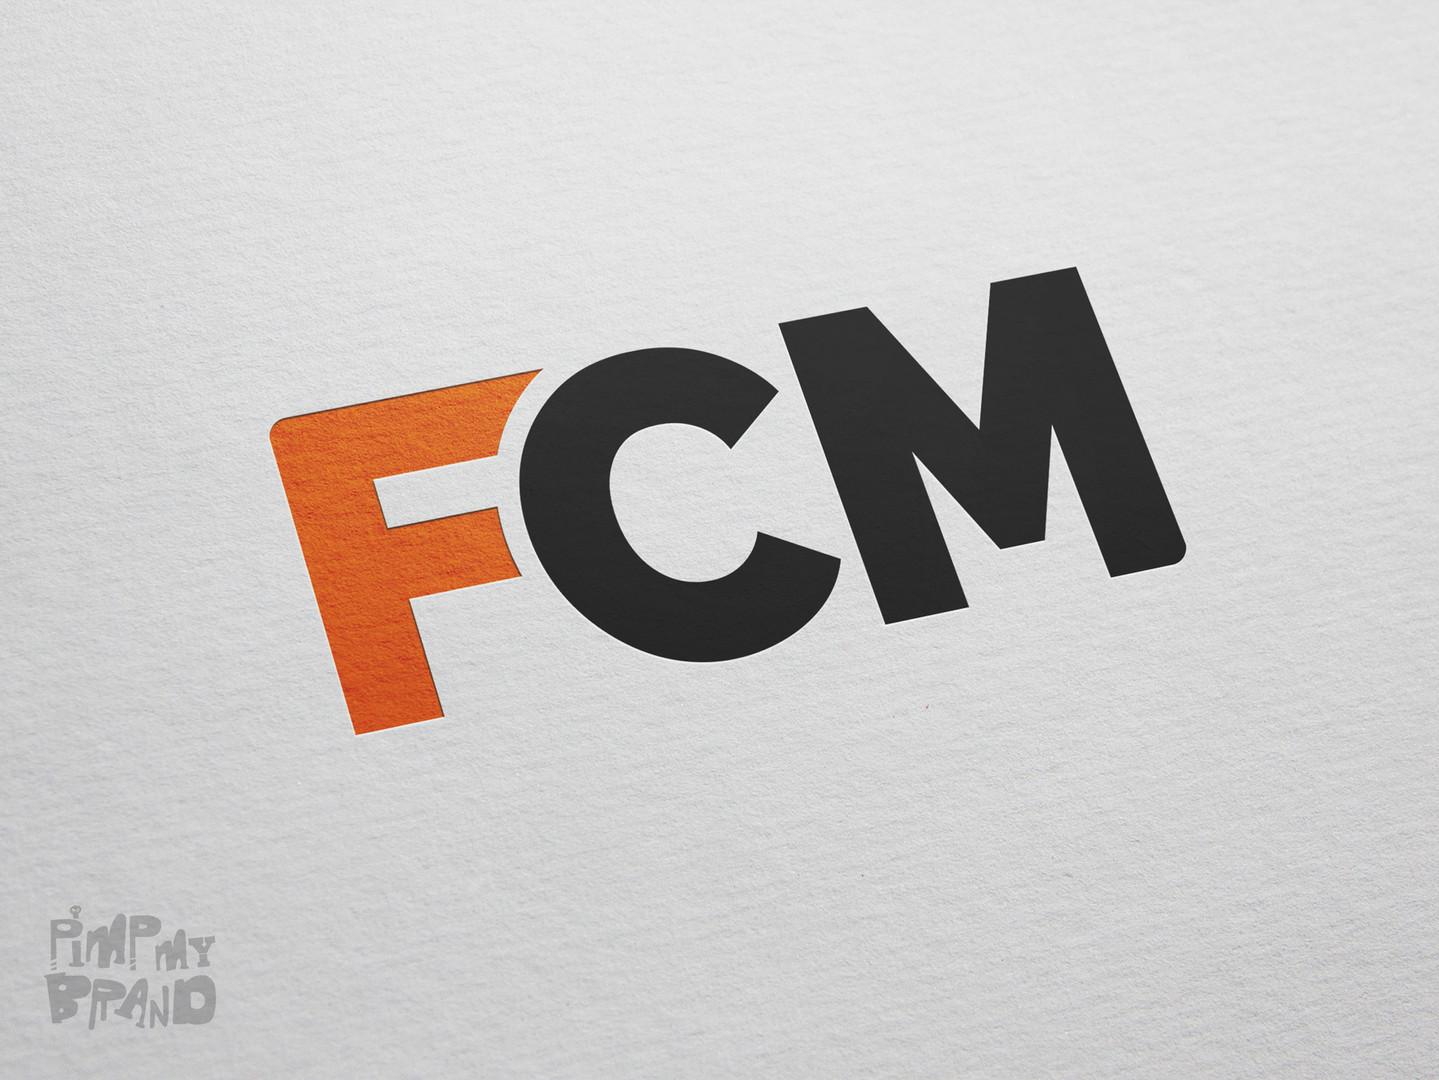 FCM automation company - brand identity